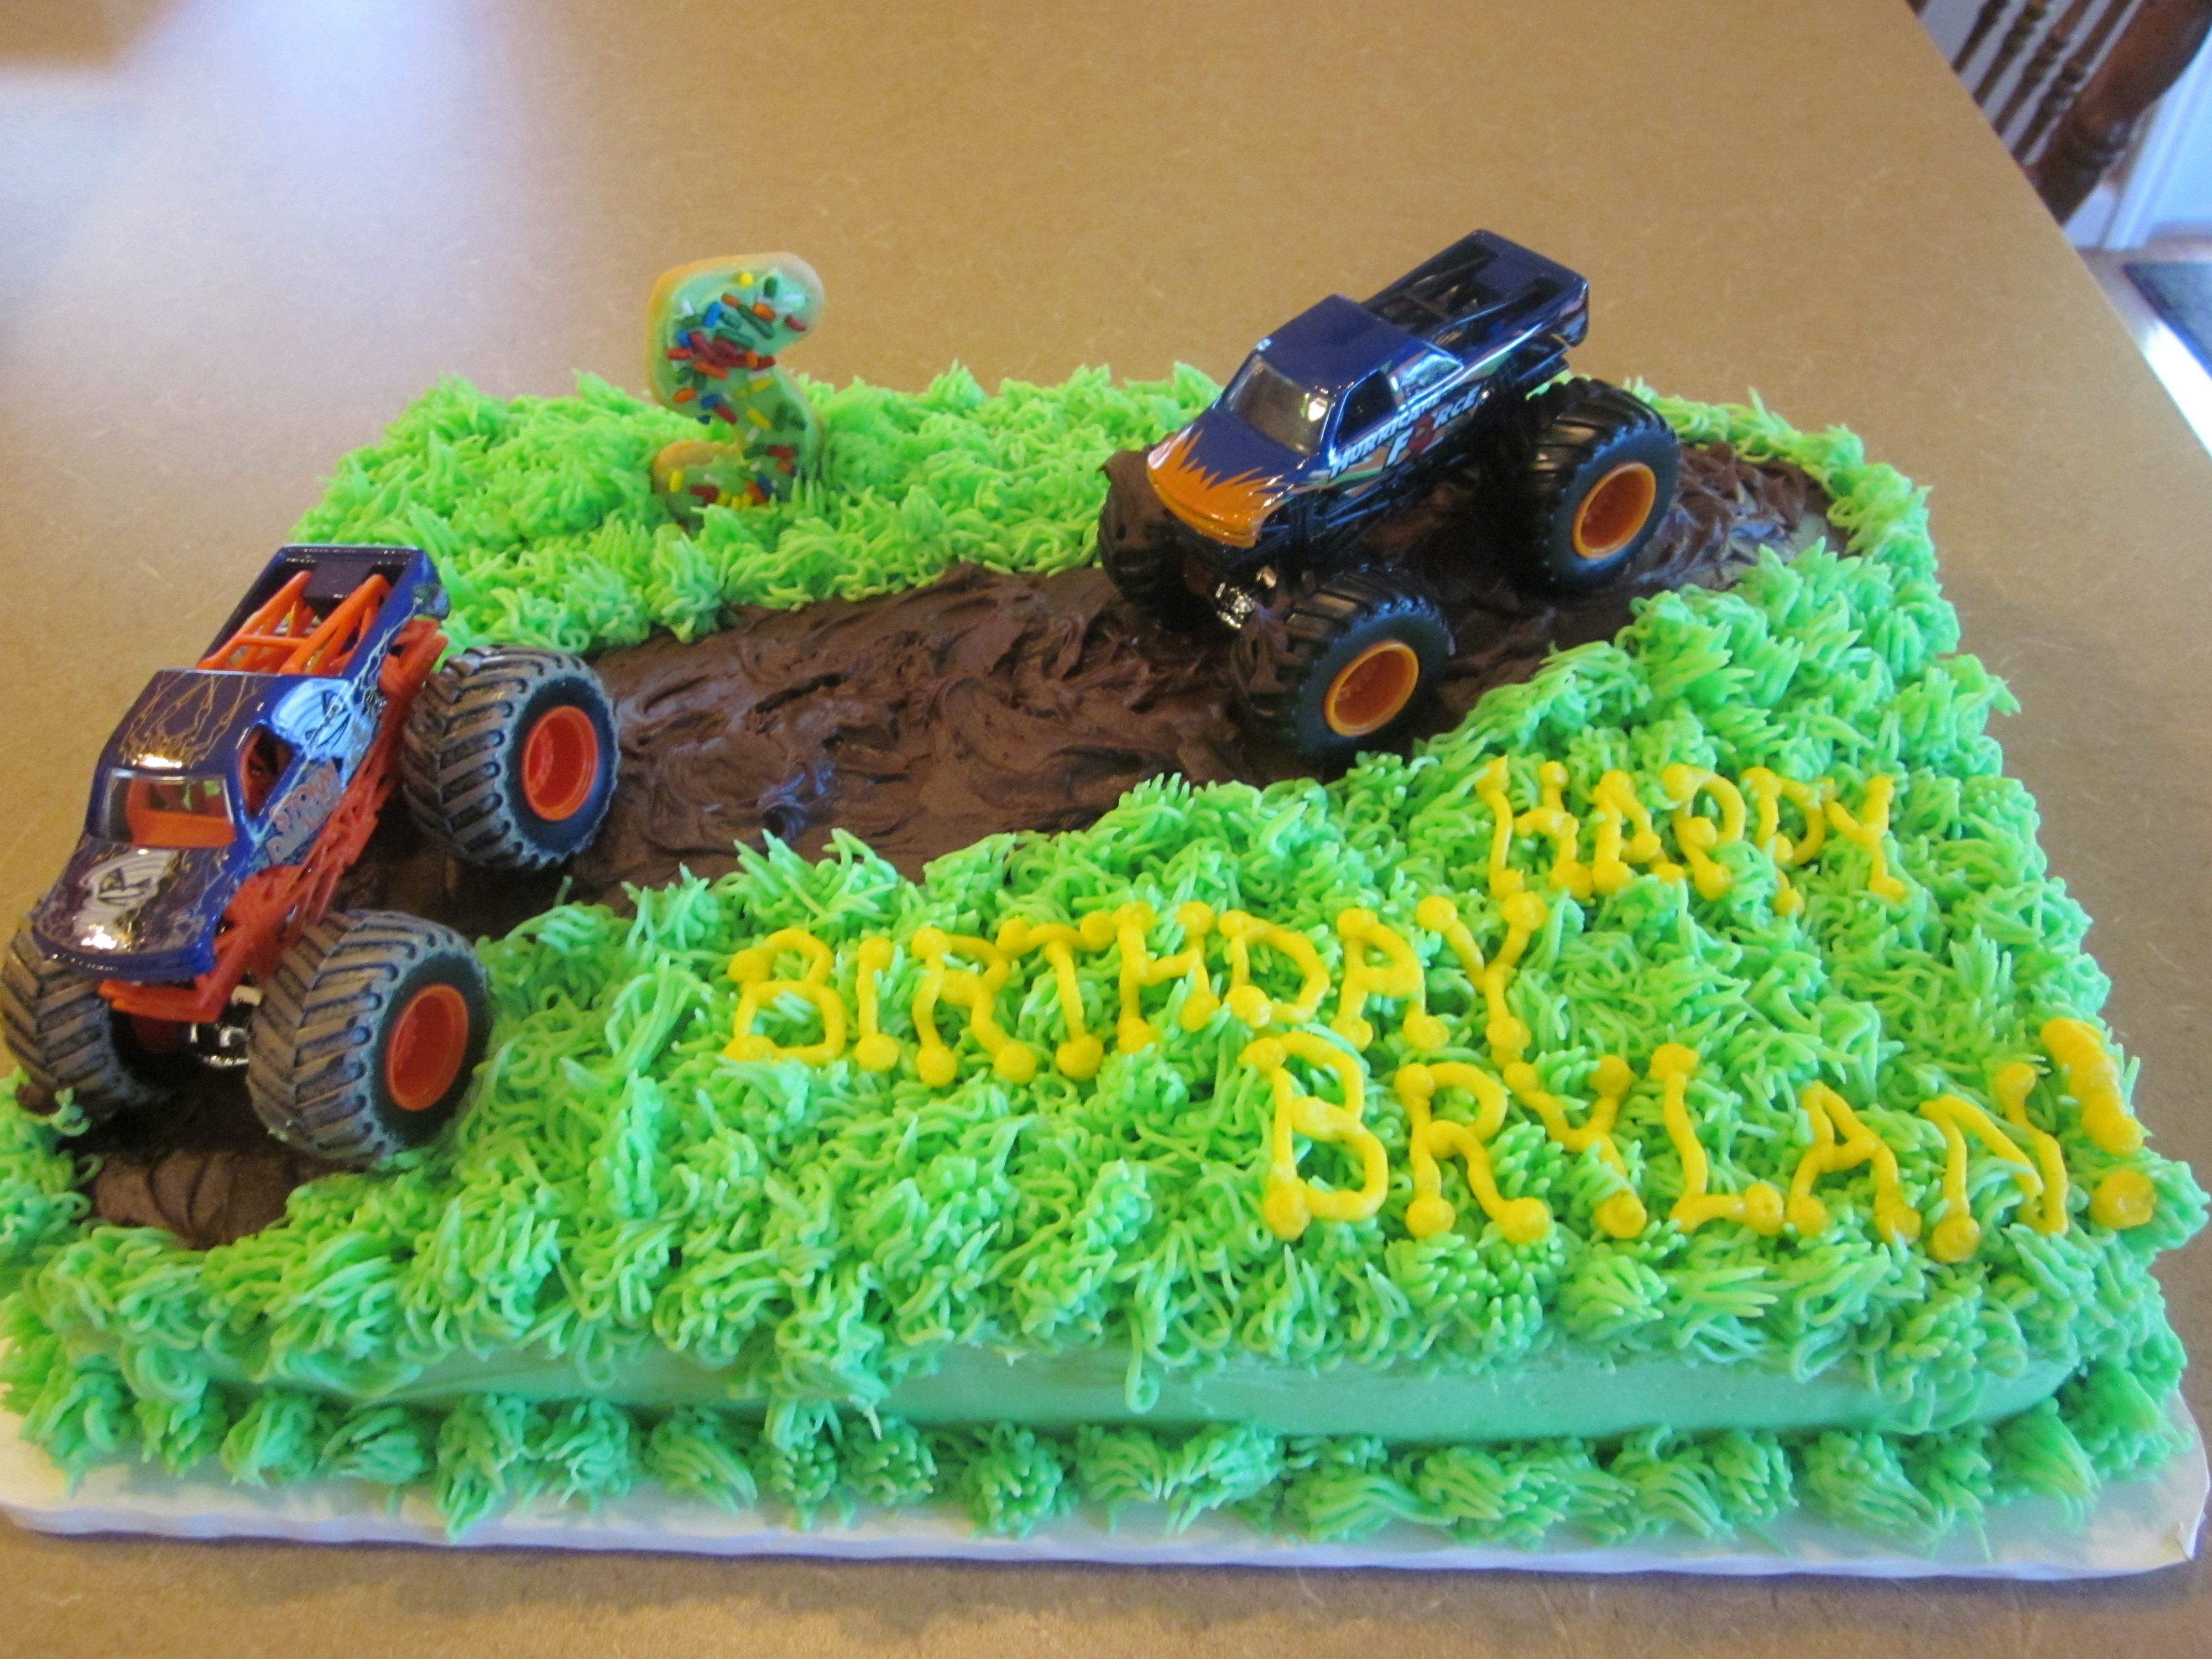 Mudding cakes